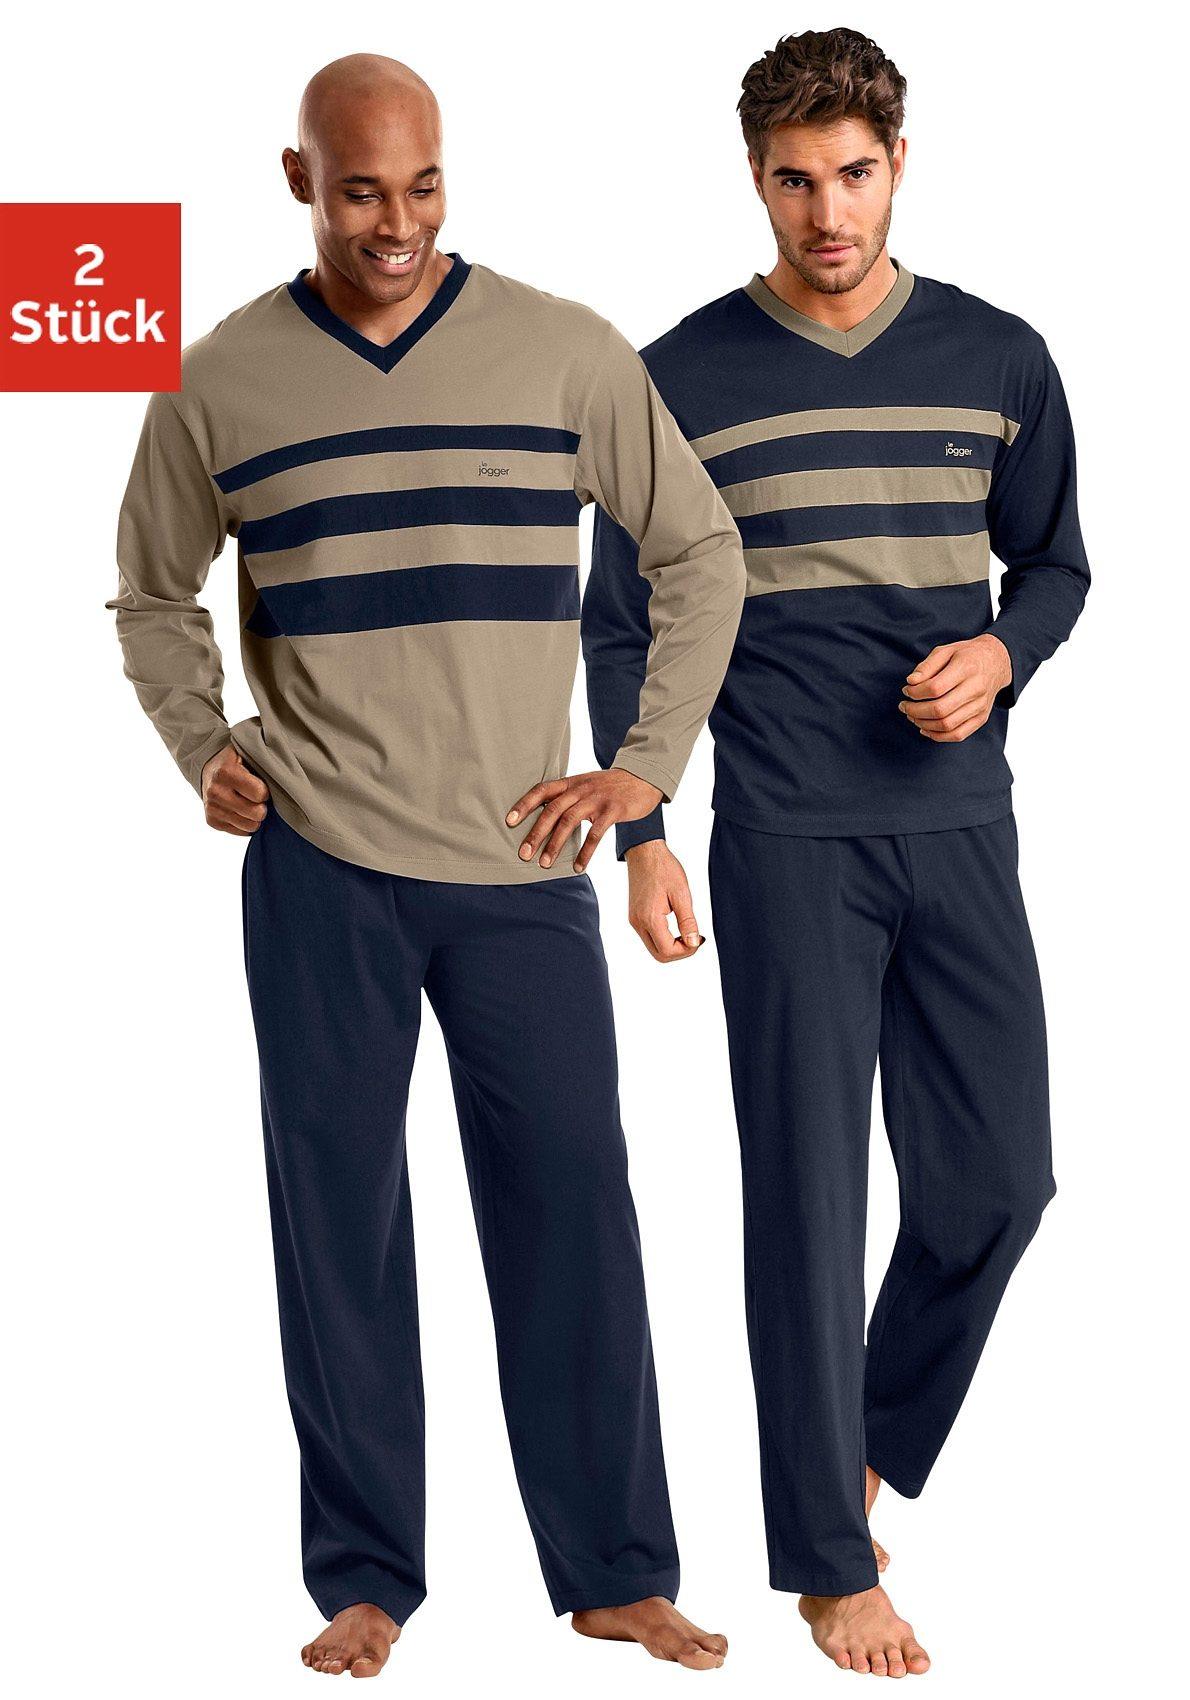 Le Jogger Pyjamas (2 Stück) mit Colourblocks   Bekleidung > Wäsche > Nachtwäsche   Le Jogger